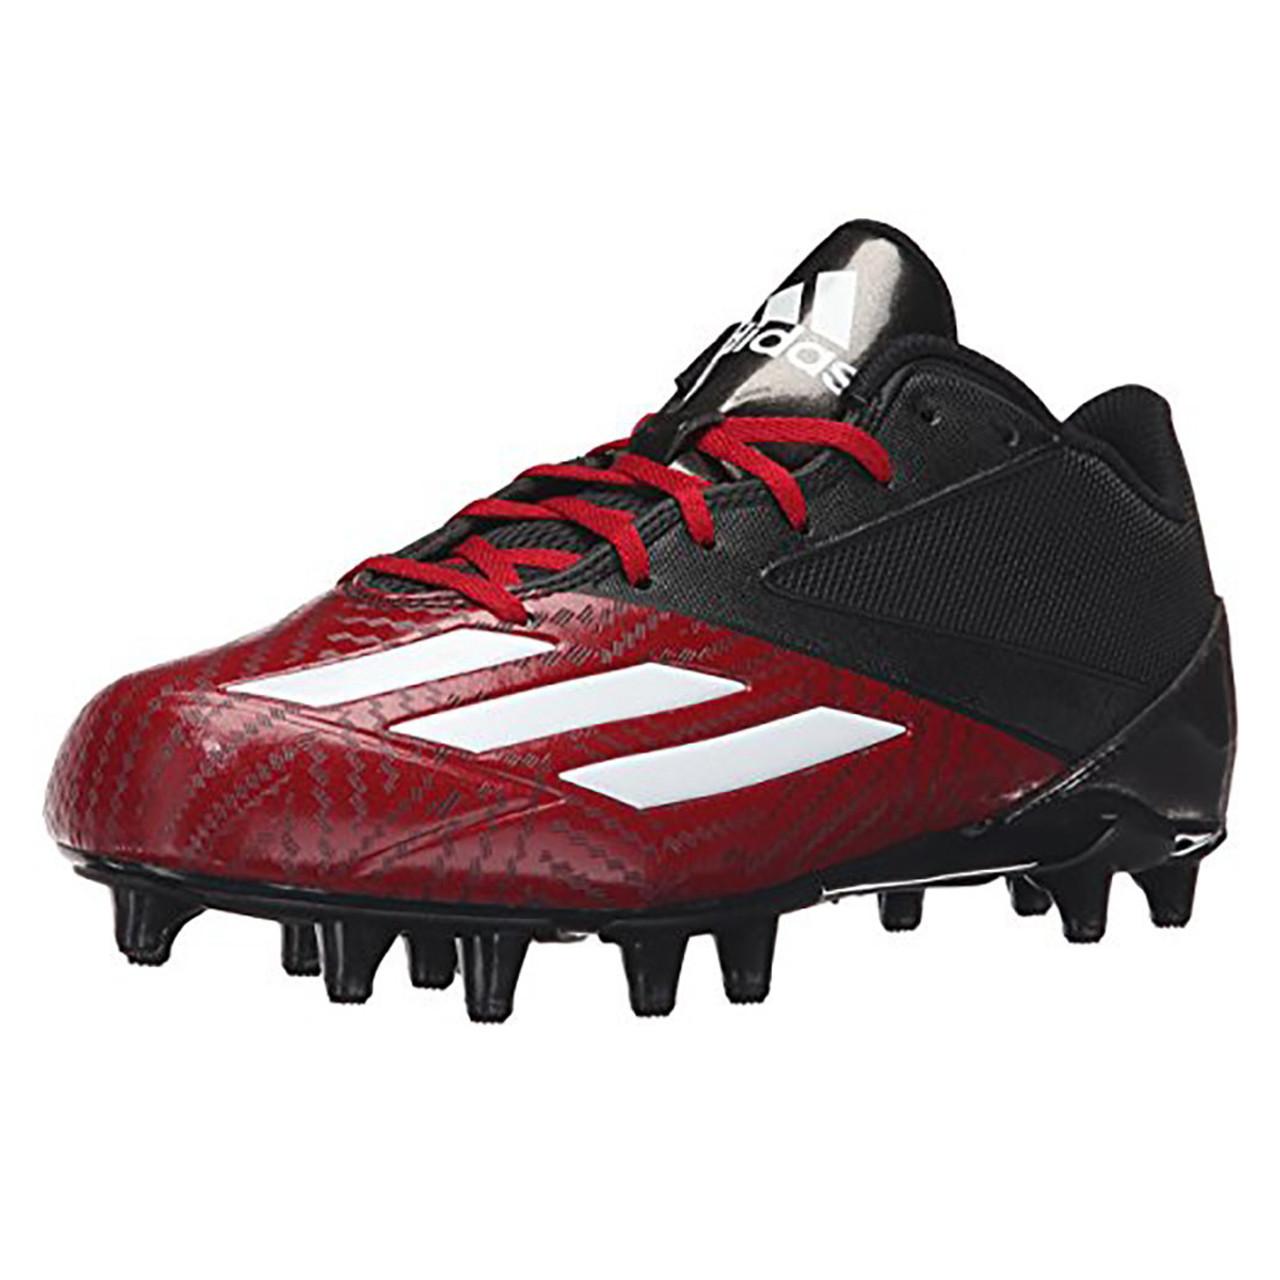 Adidas Football \u0026 Lacrosse Cleats | Men